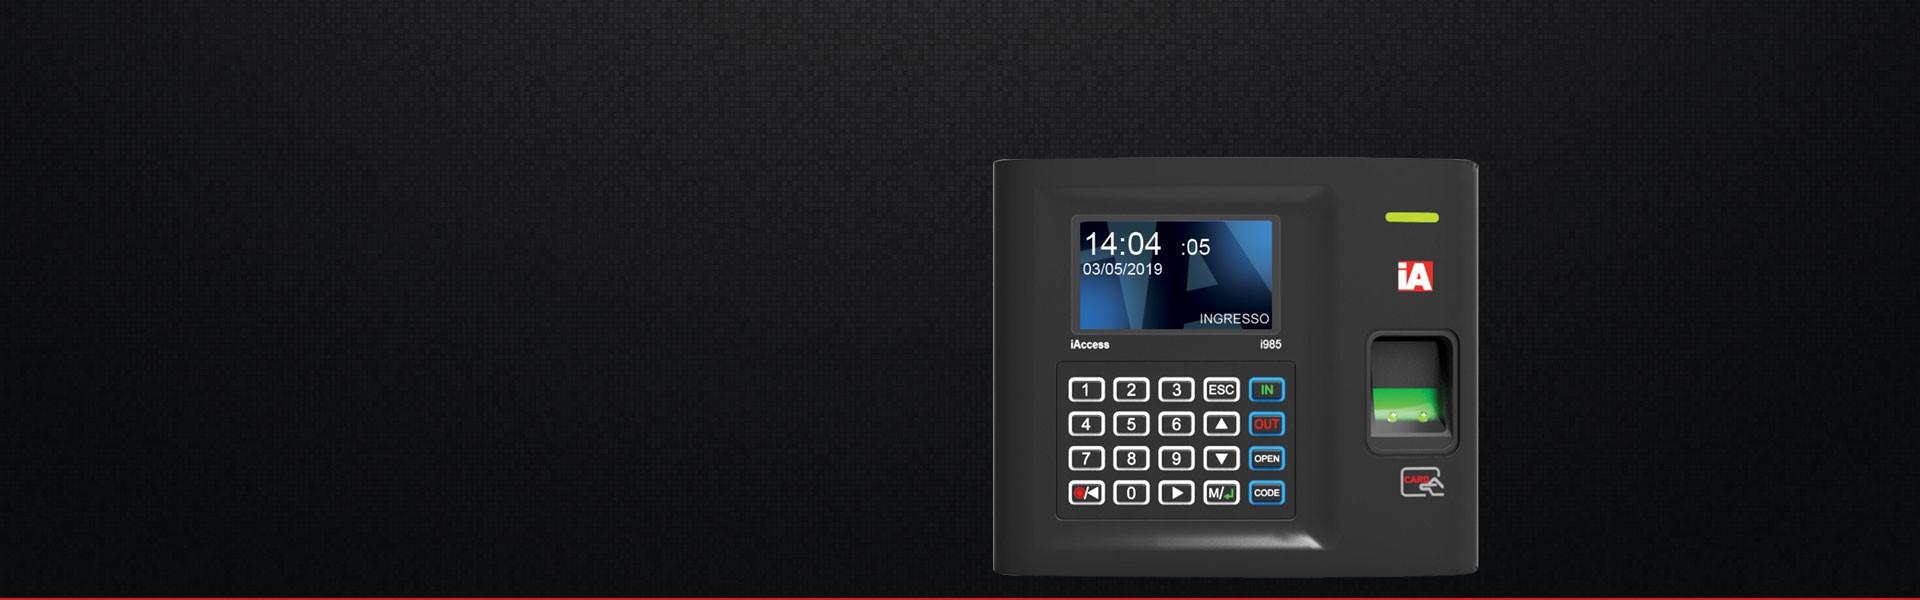 iAccess i985 W